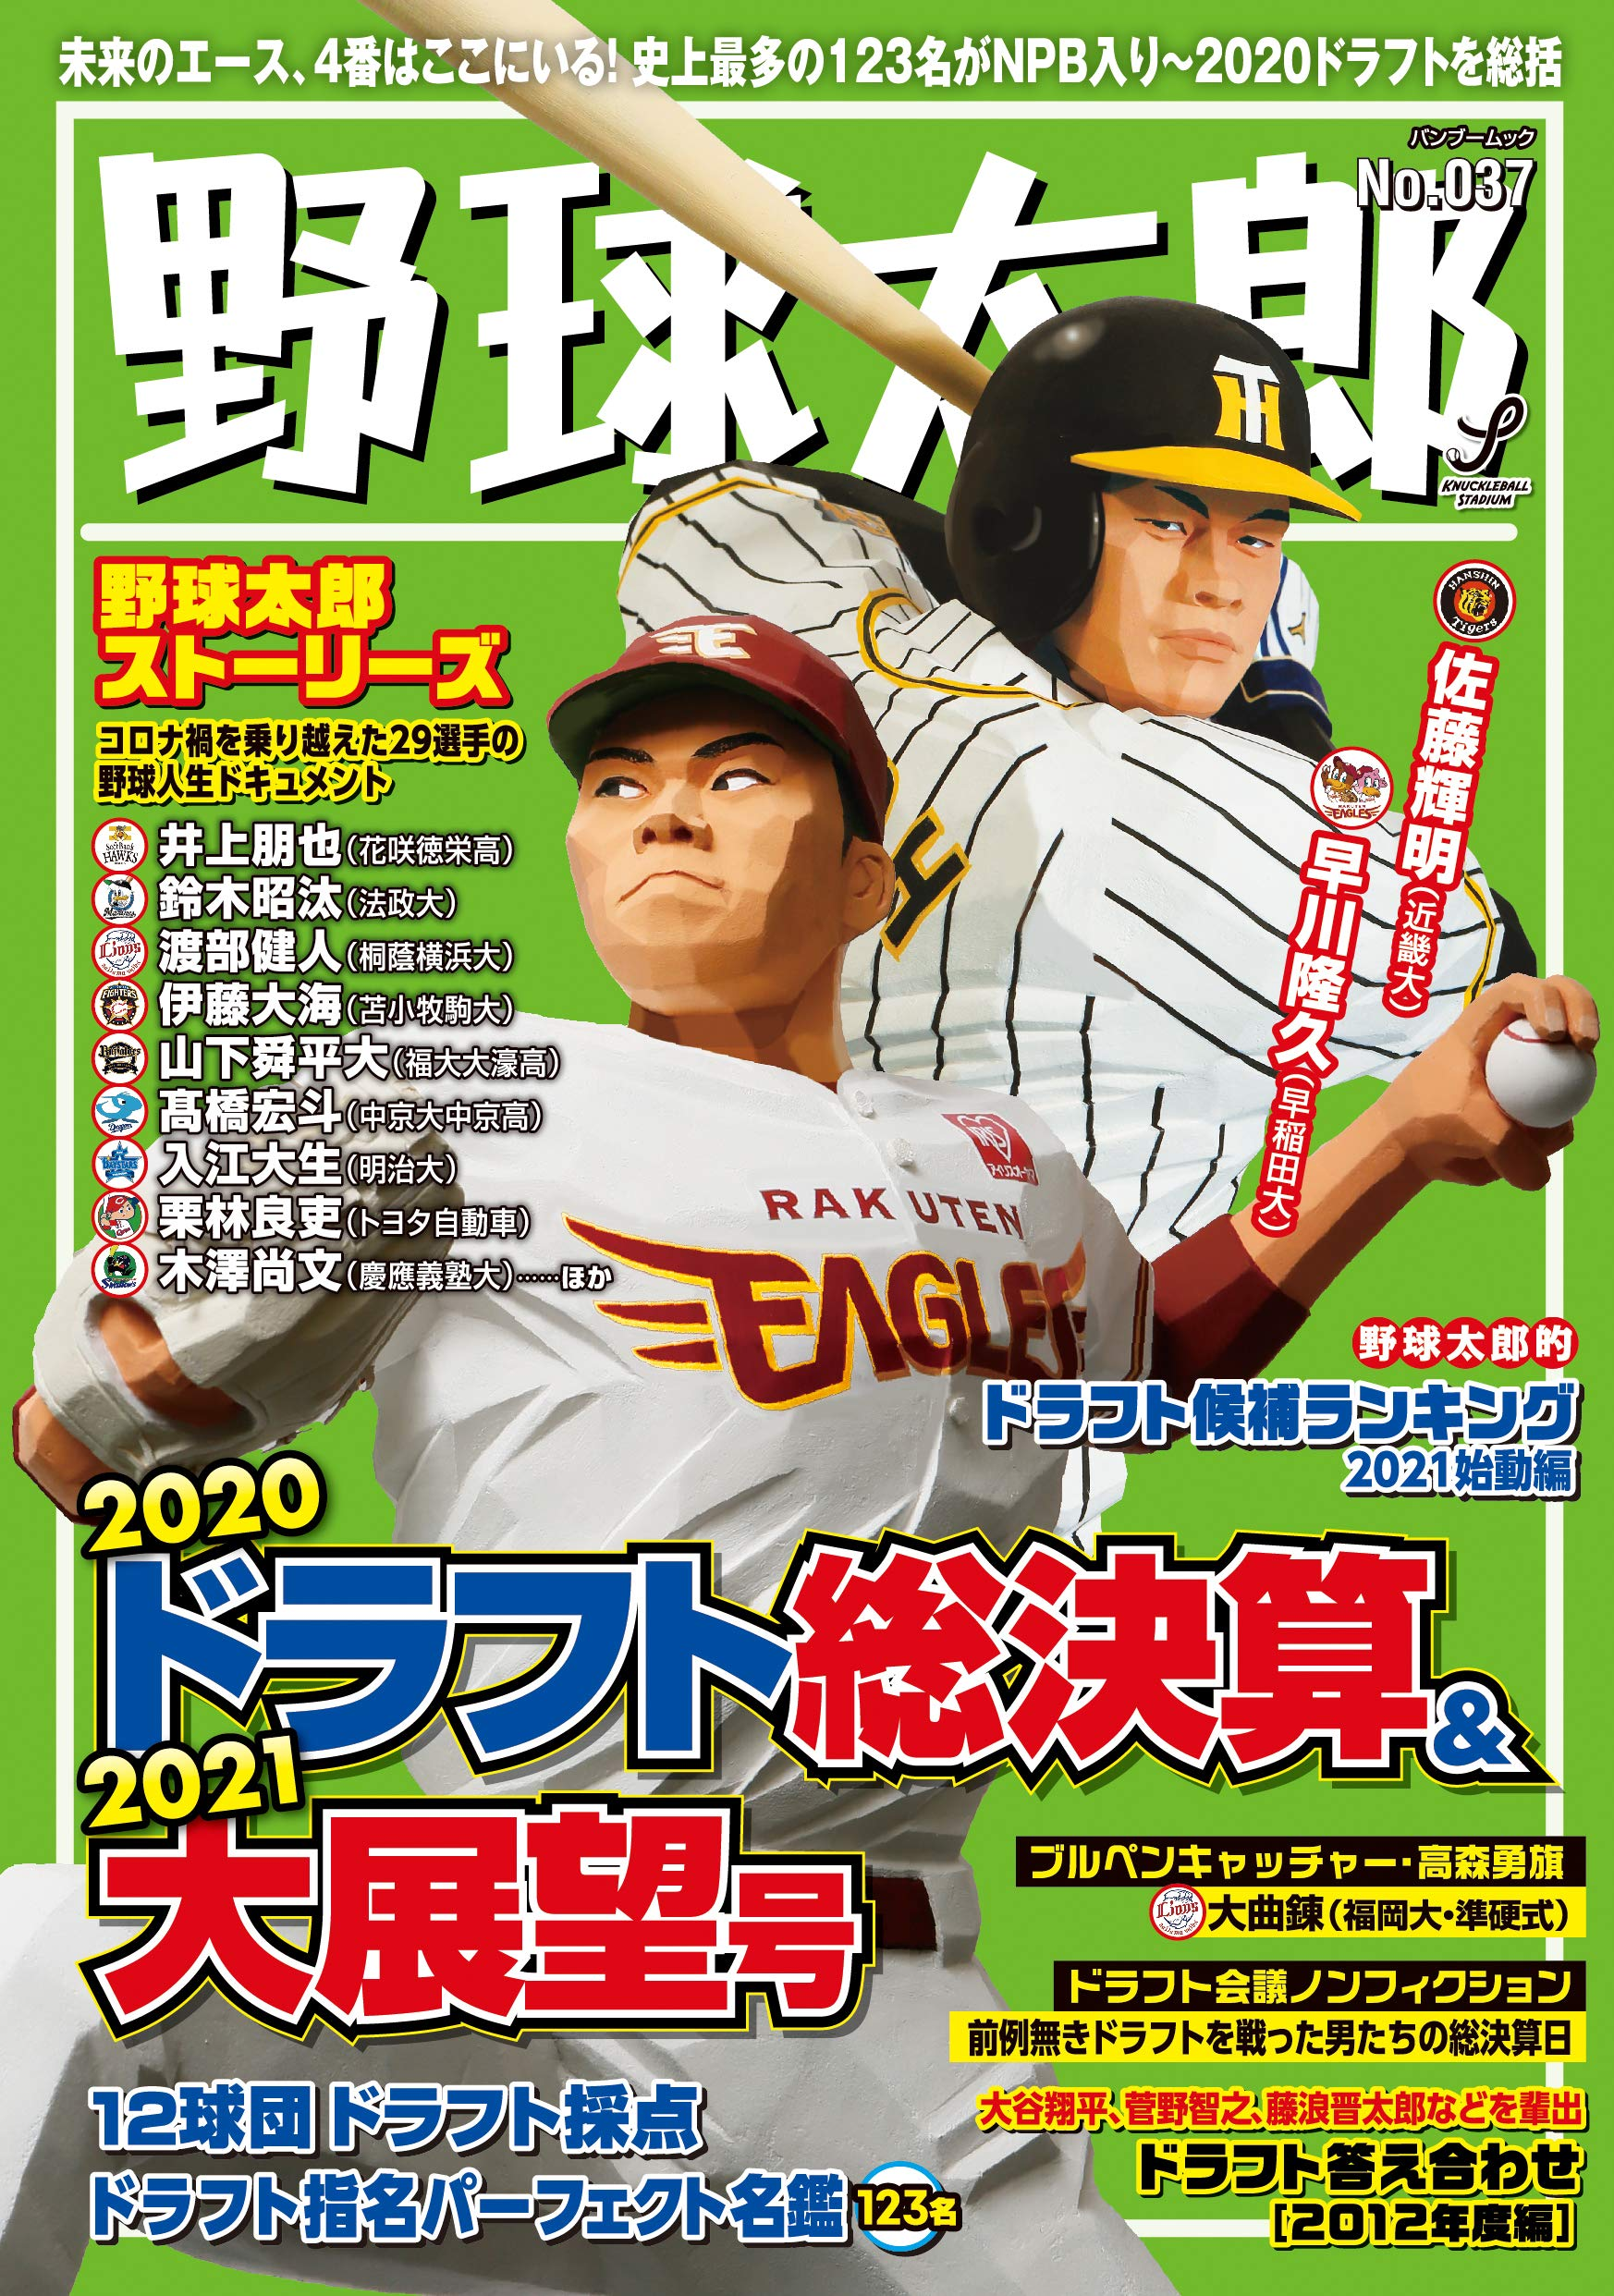 本日12月7日発売!『野球太郎No.037 2020ドラフト総決算&2021大展望号』